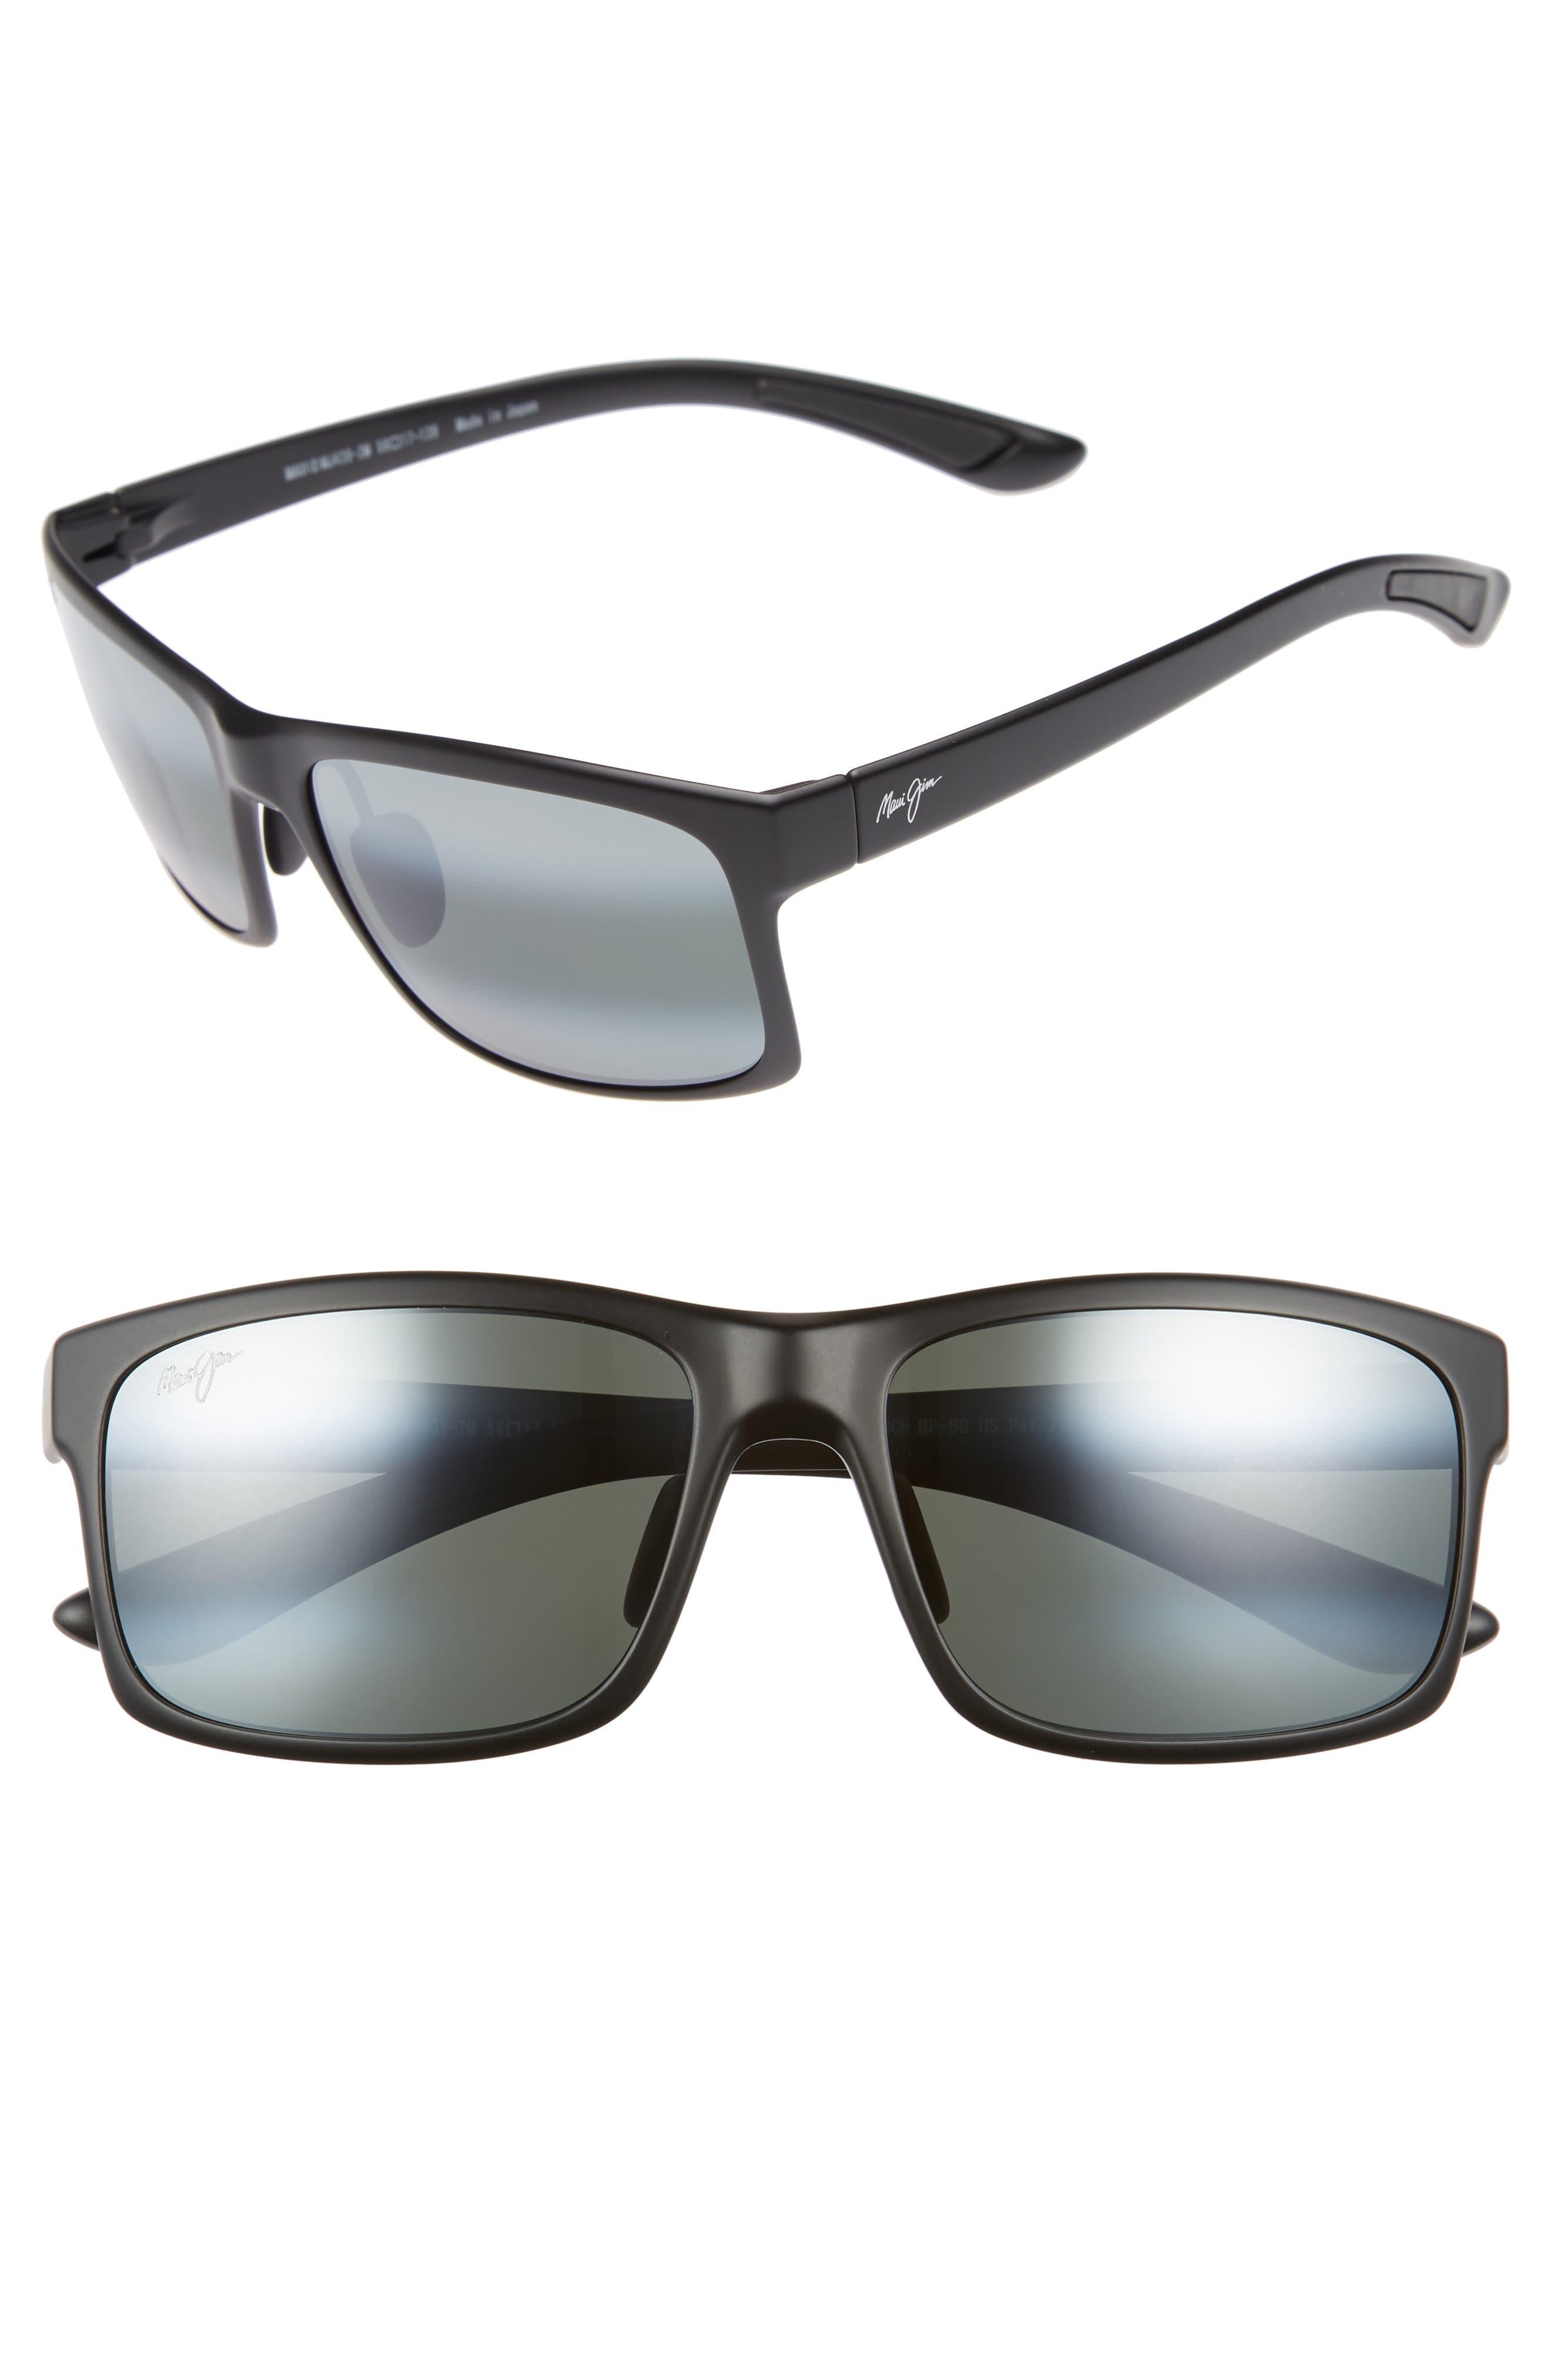 Pokowai Arch 58mm Polarized Sunglasses,                         Main,                         color, BLACK MATTE/ NEUTRAL GREY